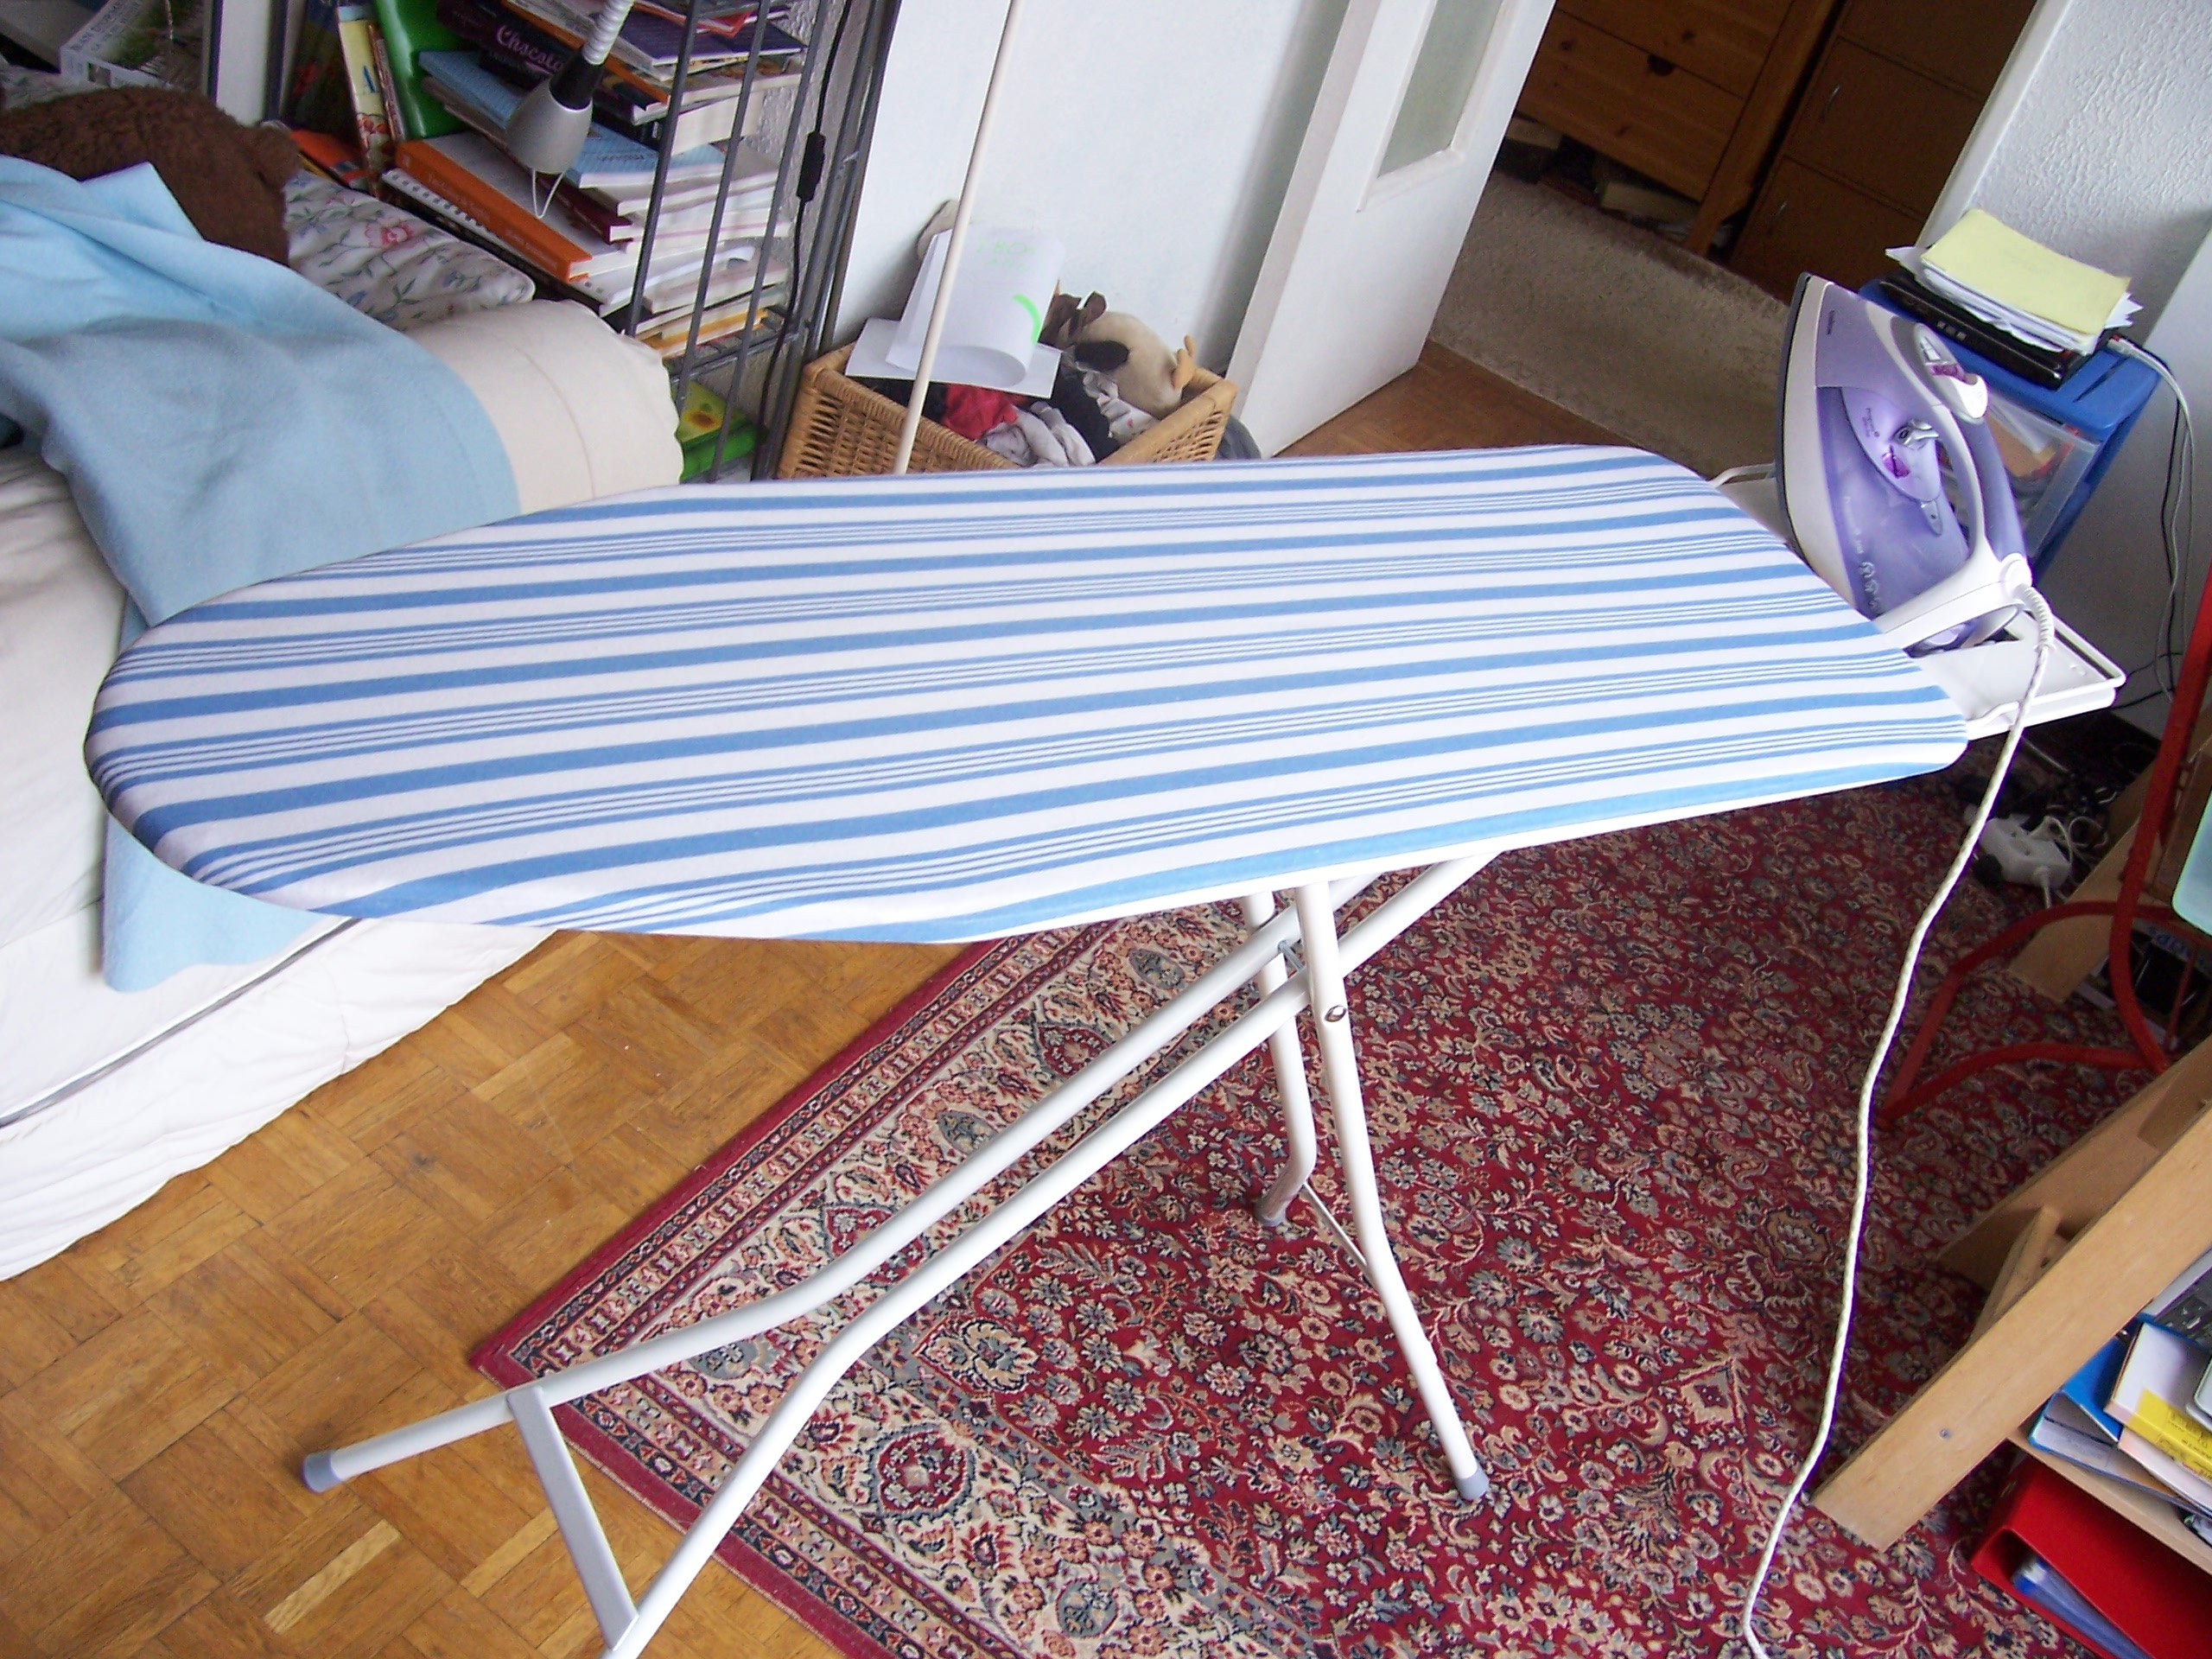 file planche repasser jpg wikimedia commons. Black Bedroom Furniture Sets. Home Design Ideas